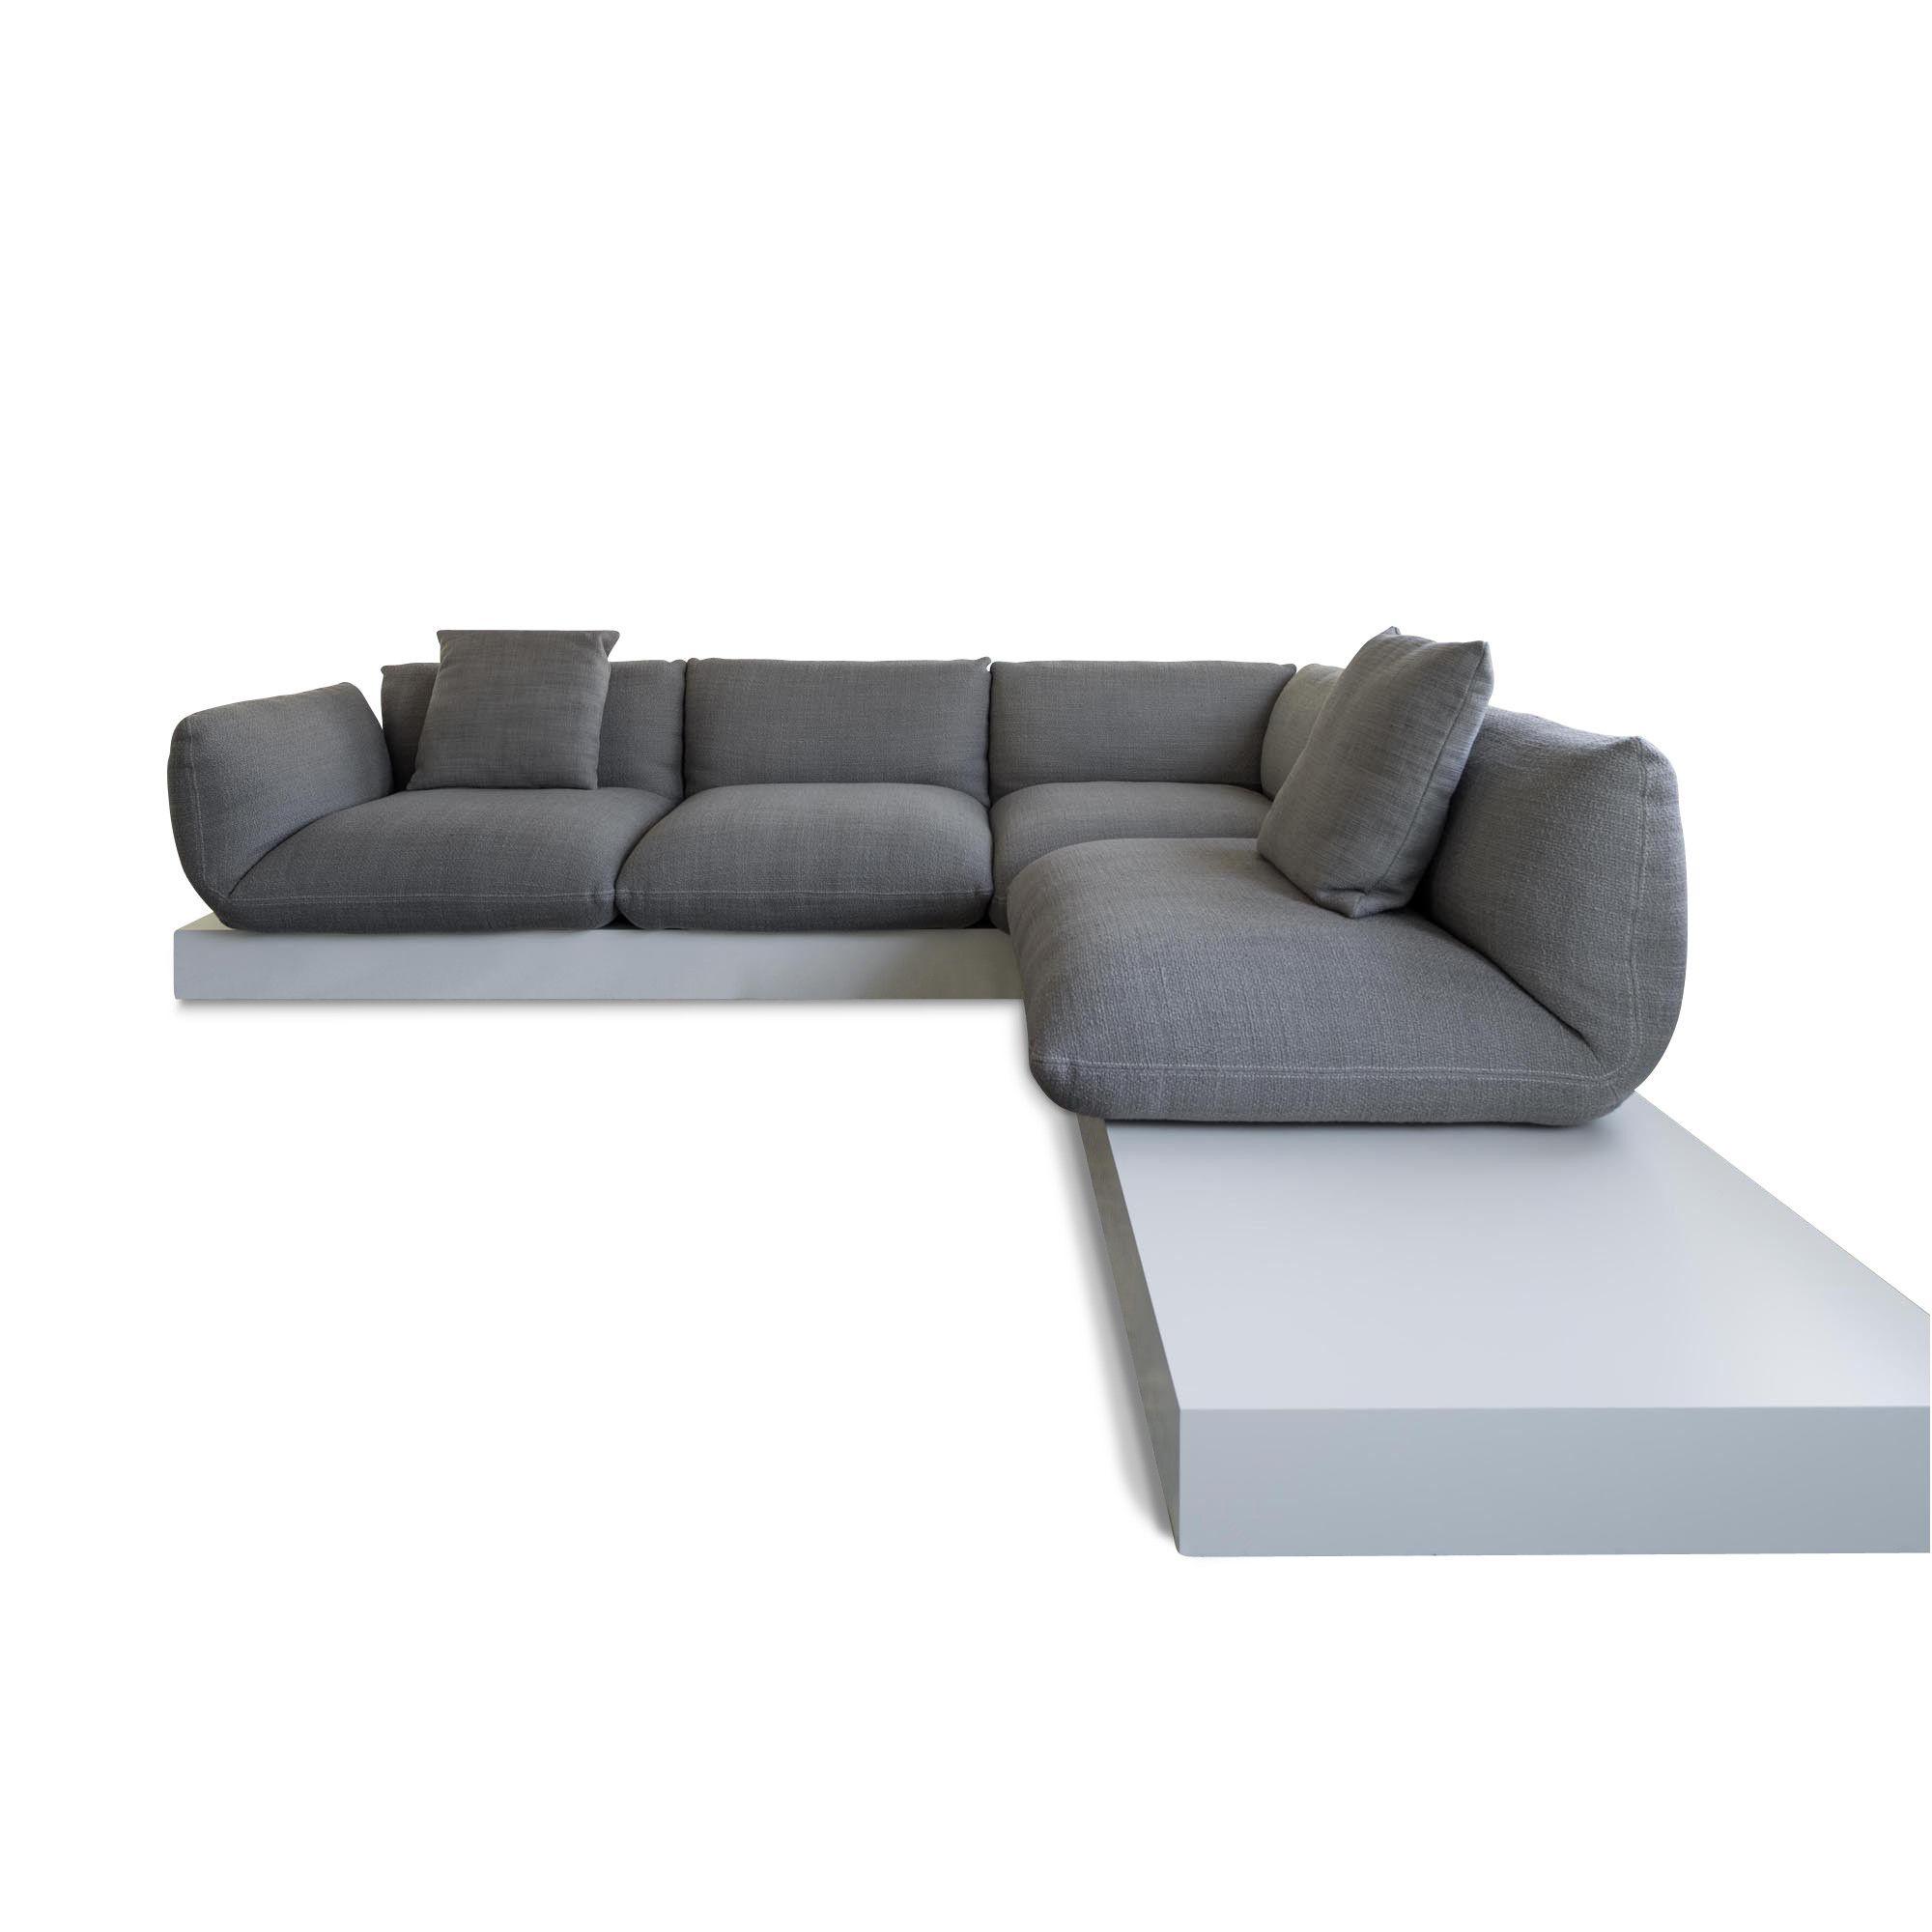 Fabulous Relax Ecksofa Elegant Sofa Sofa Design Couch